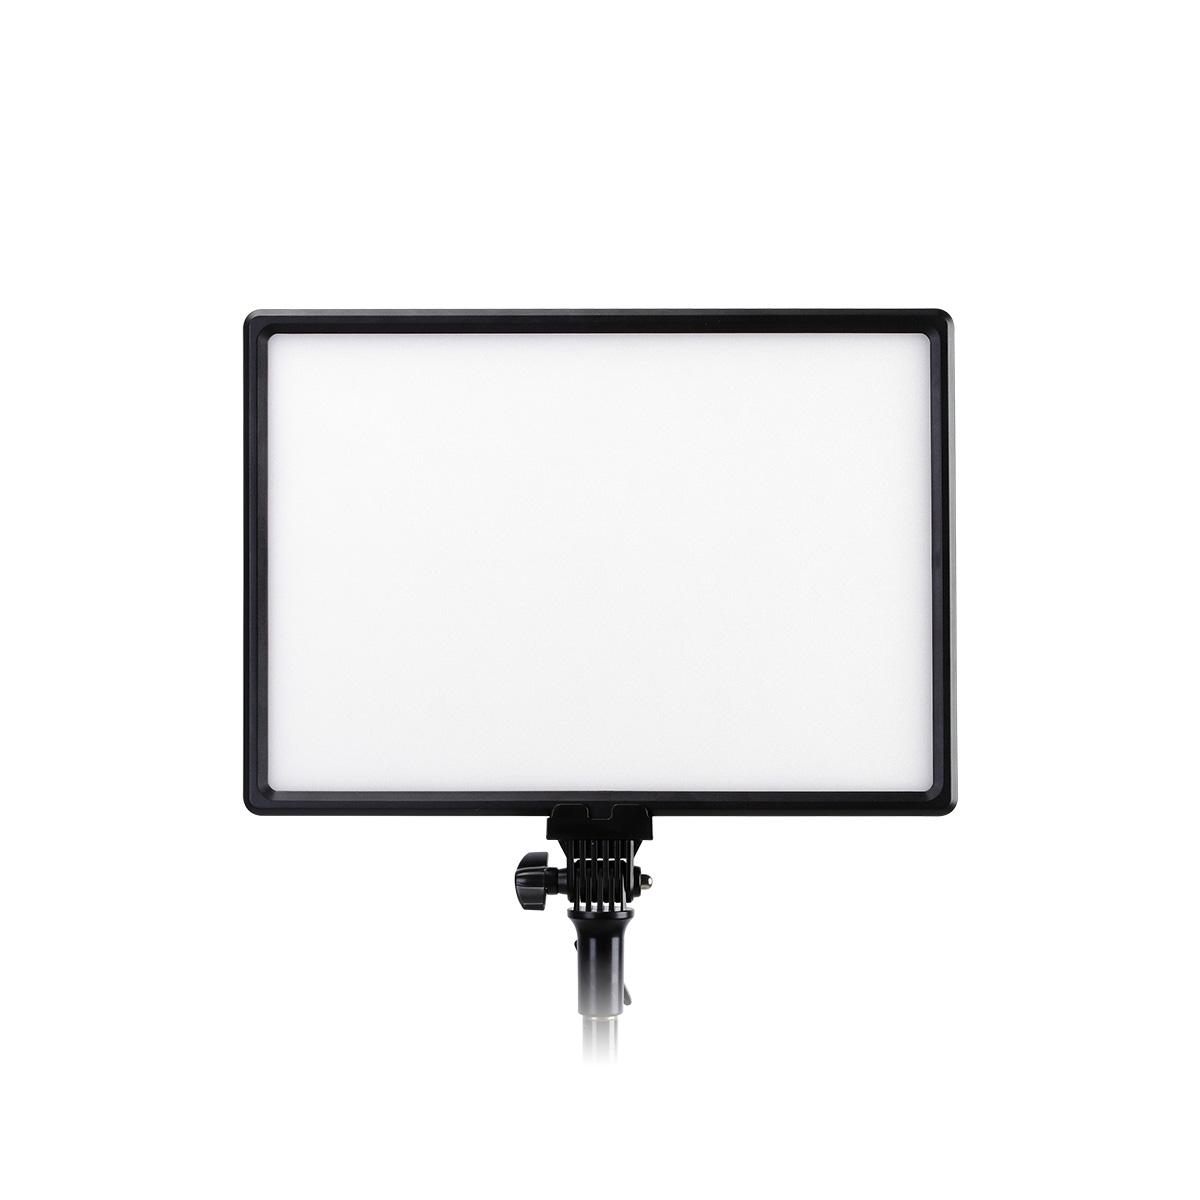 Phottix Nuada S3 LED Light